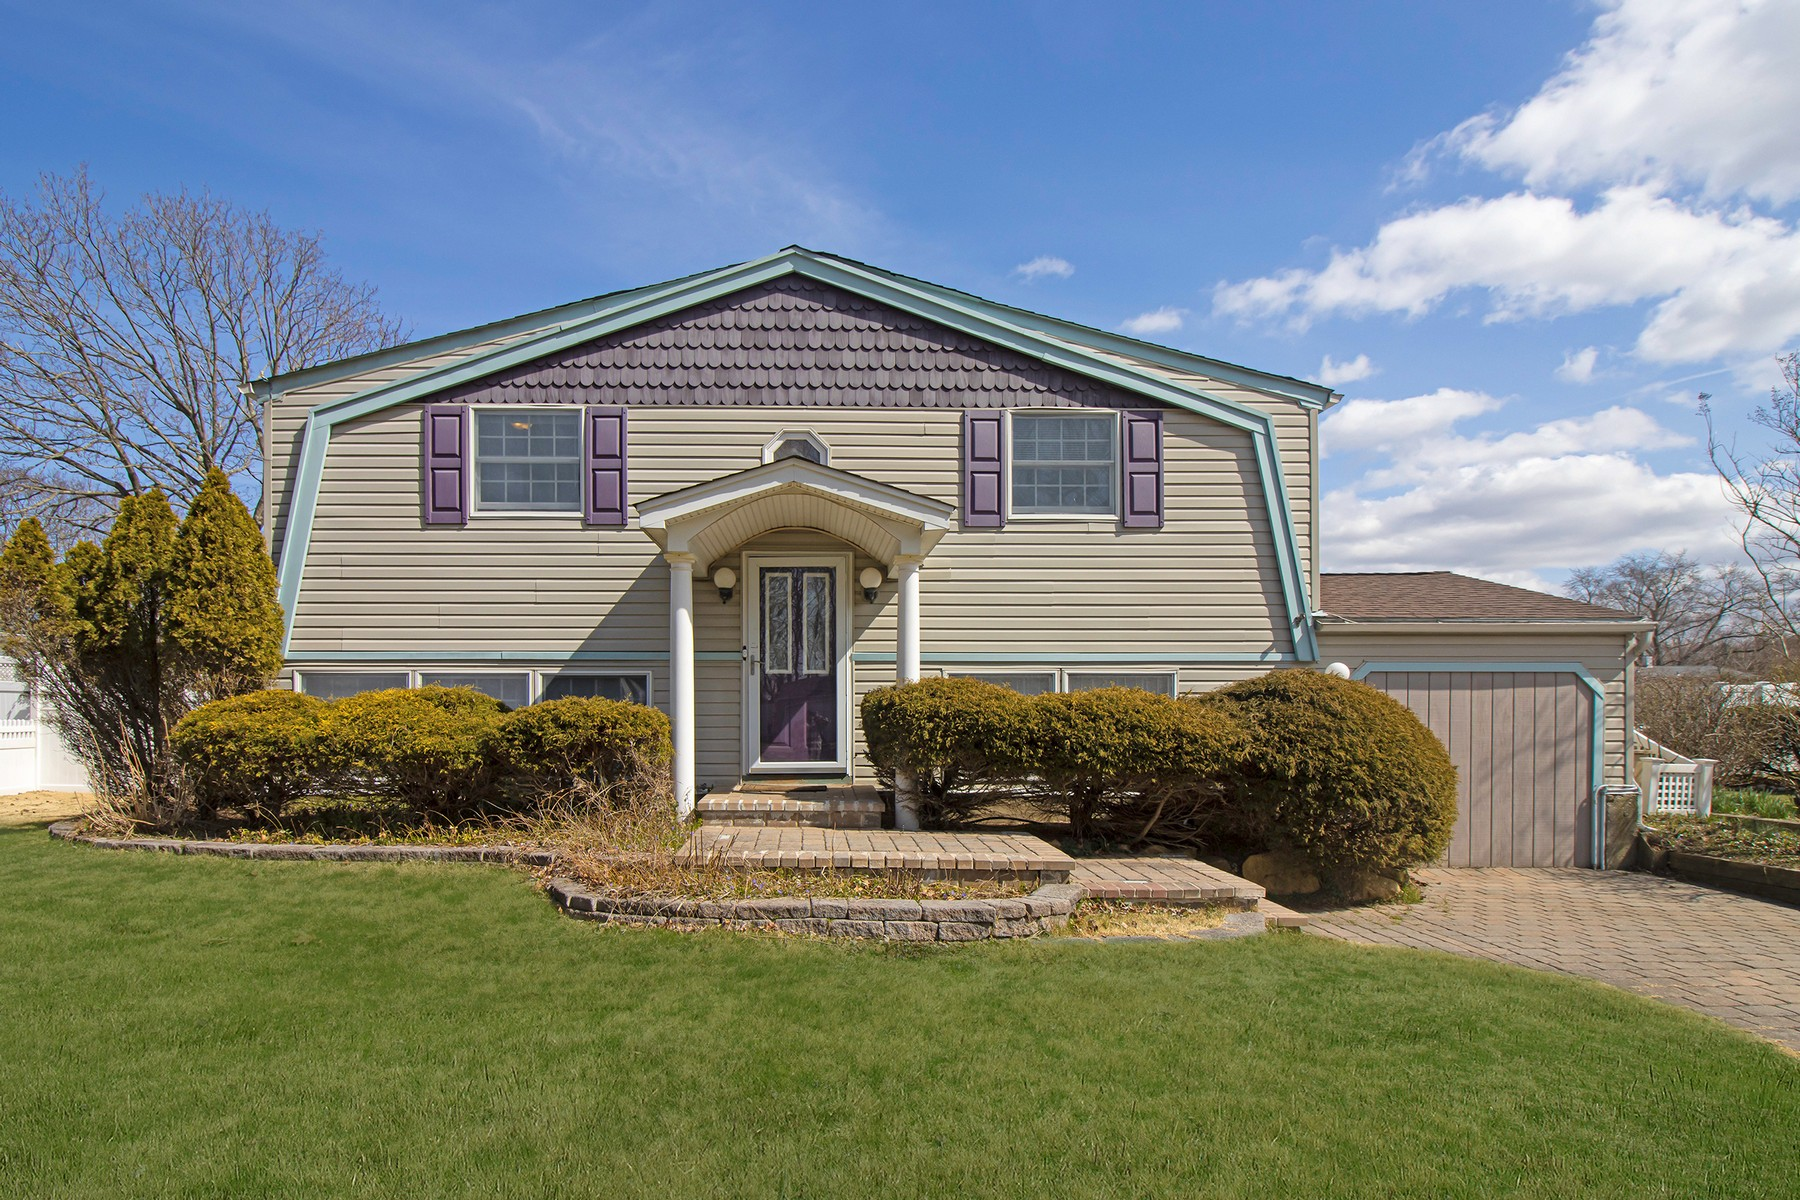 Single Family Homes for Active at Stony Brook 55 University Heigh Drive Stony Brook, New York 11790 United States